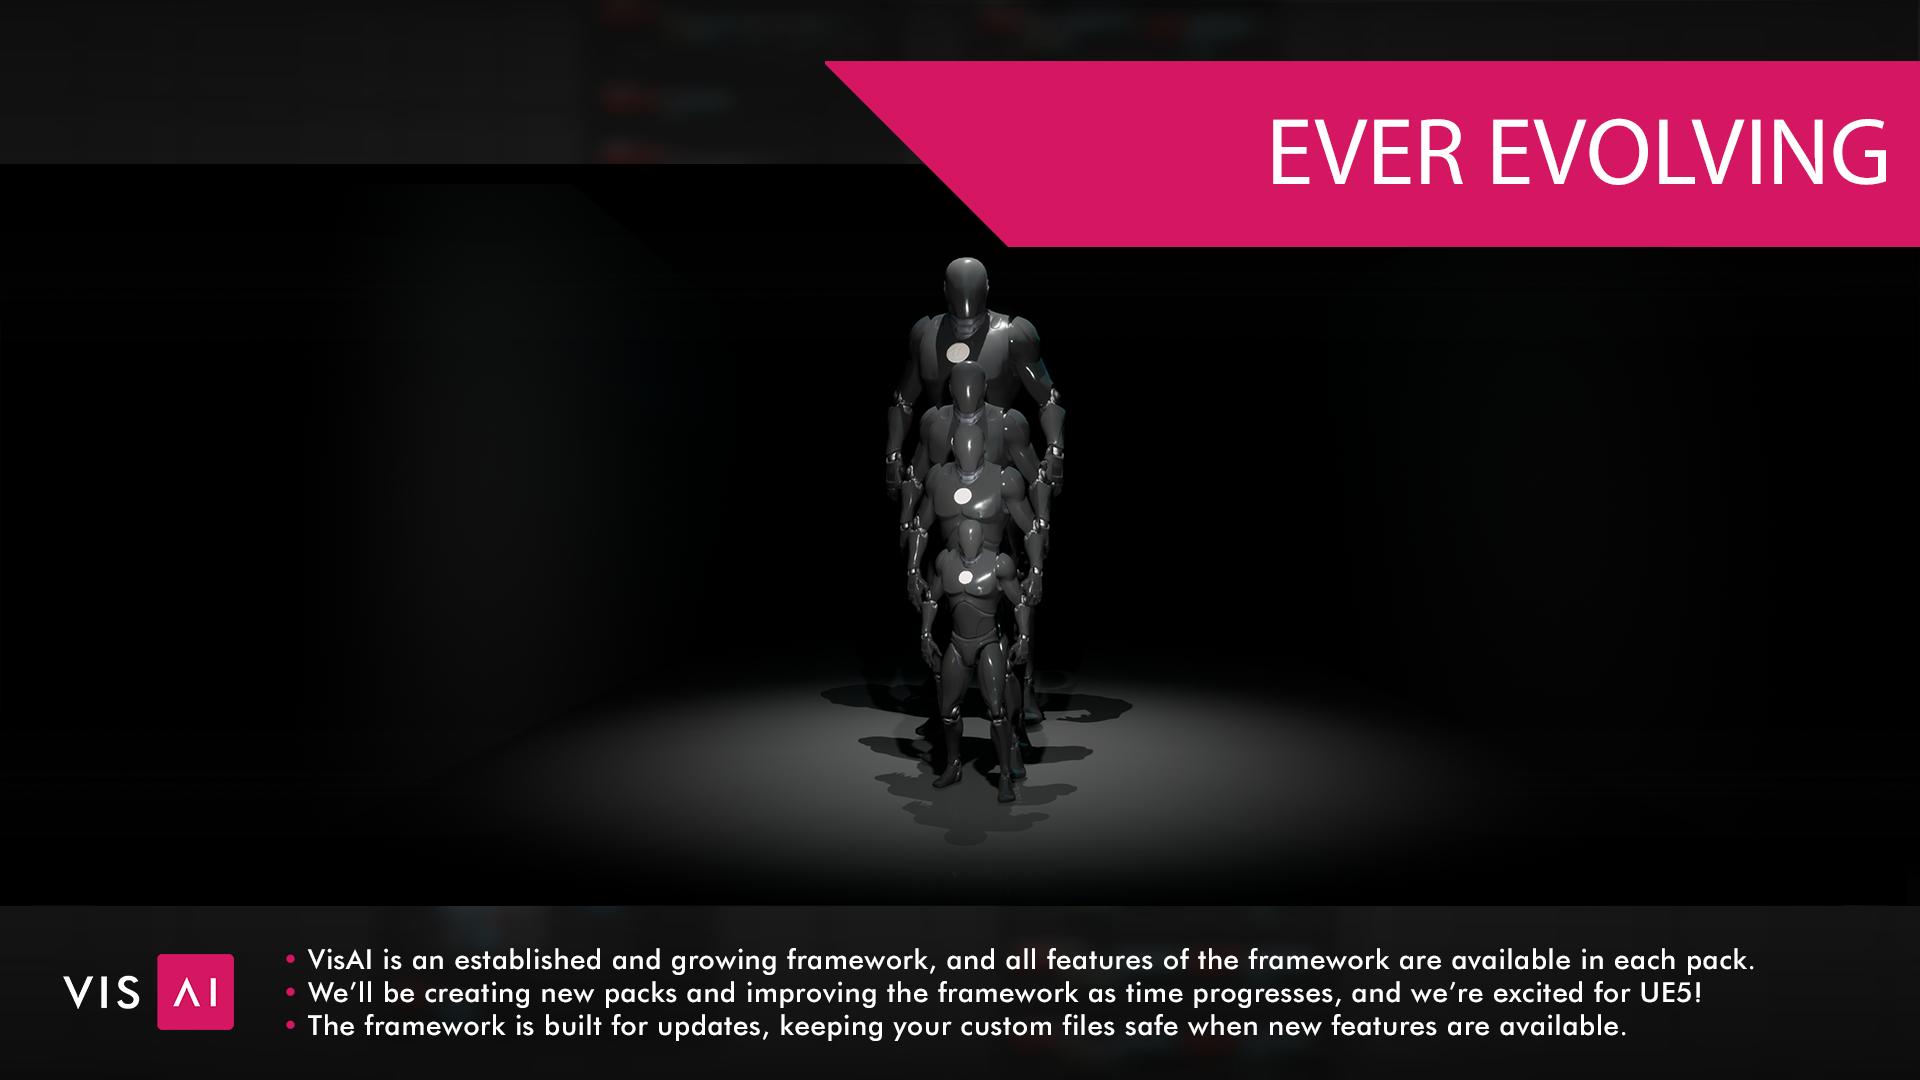 6 EVER EVOLVING